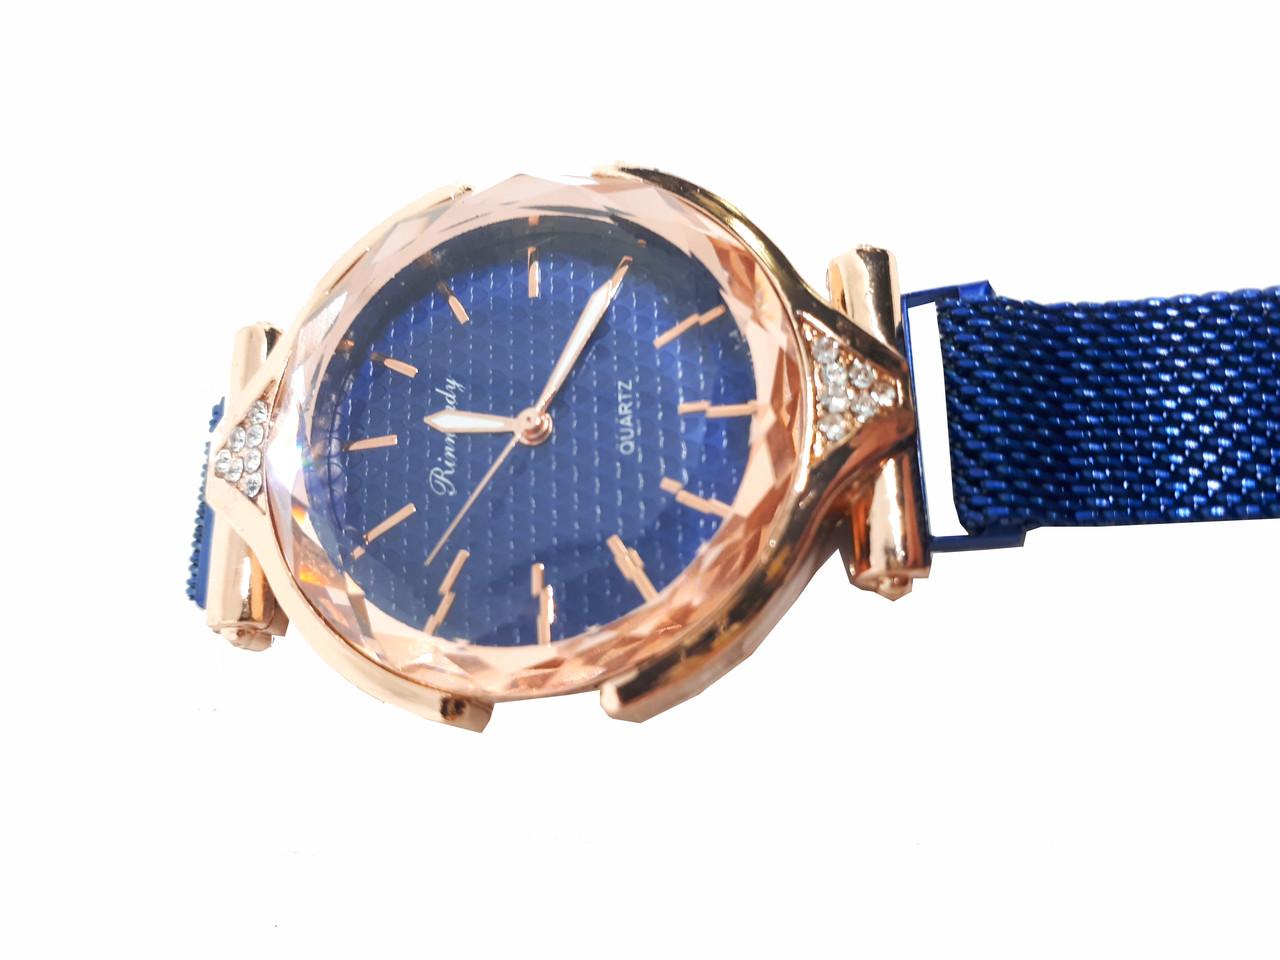 Часы кварцевые  Rinnady с камнями на  магнитном браслете . Синий